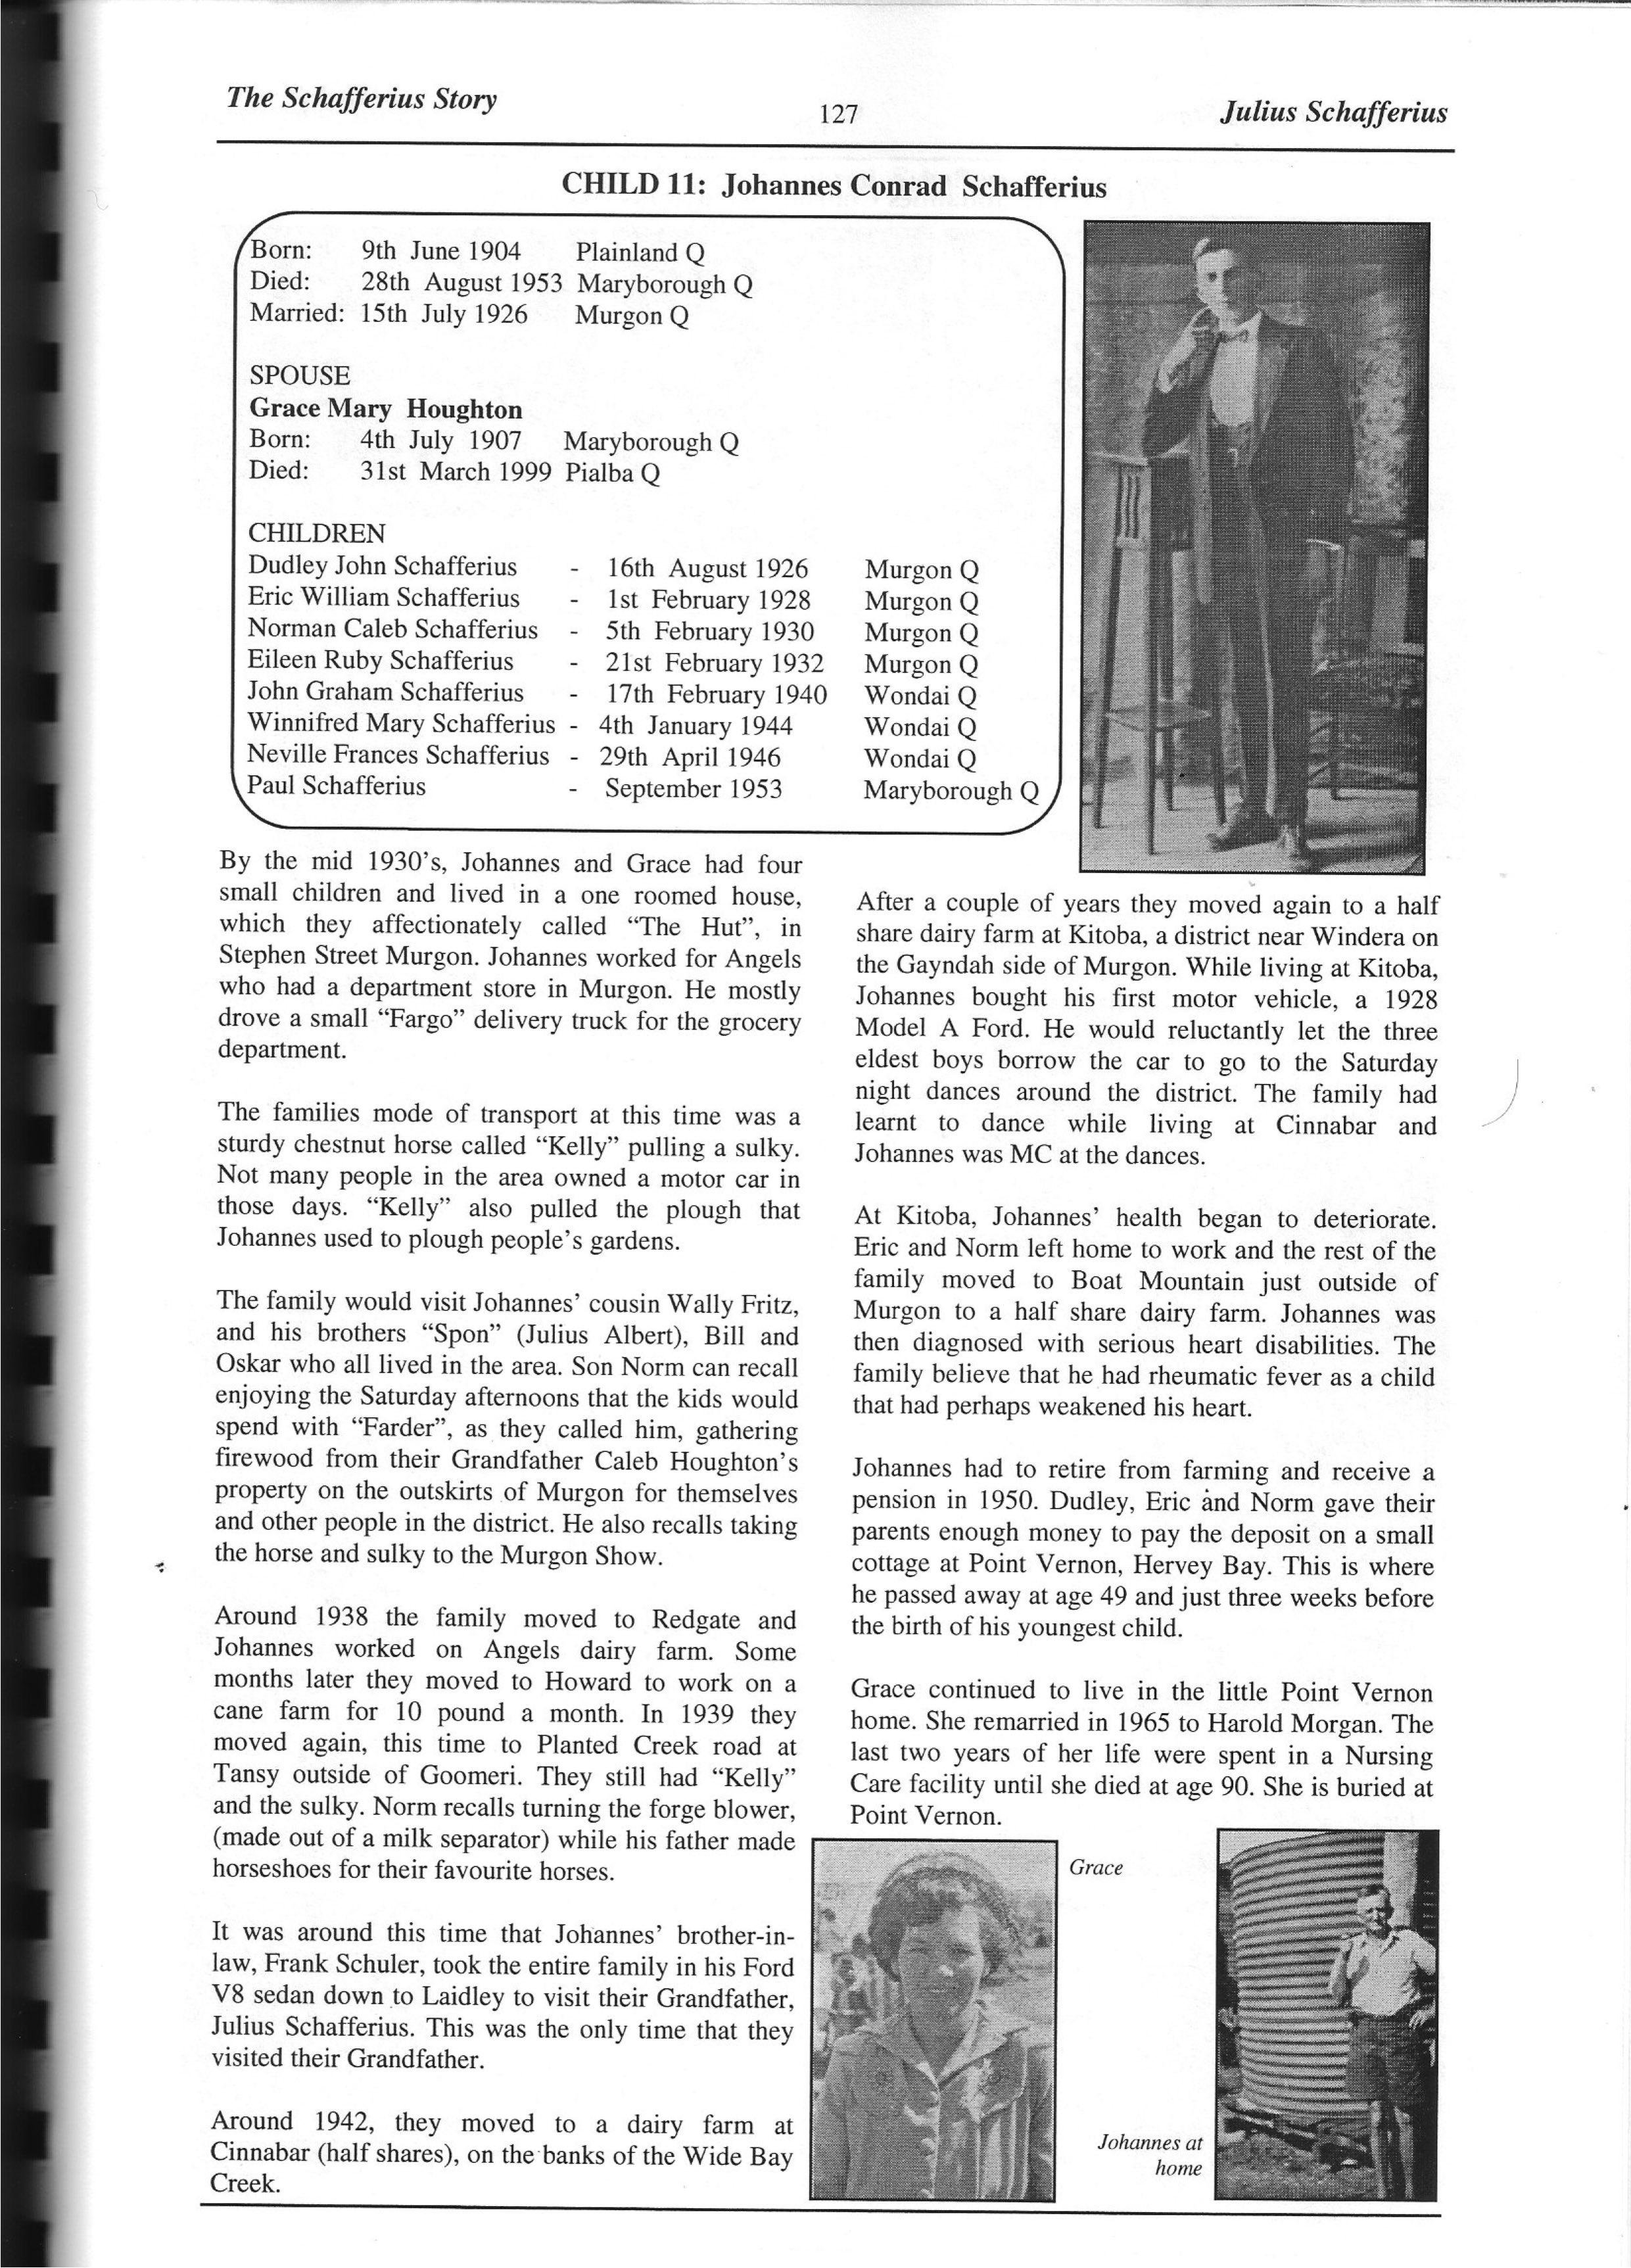 The Schafferius Story p 127Johannes Conrad Schafferius and